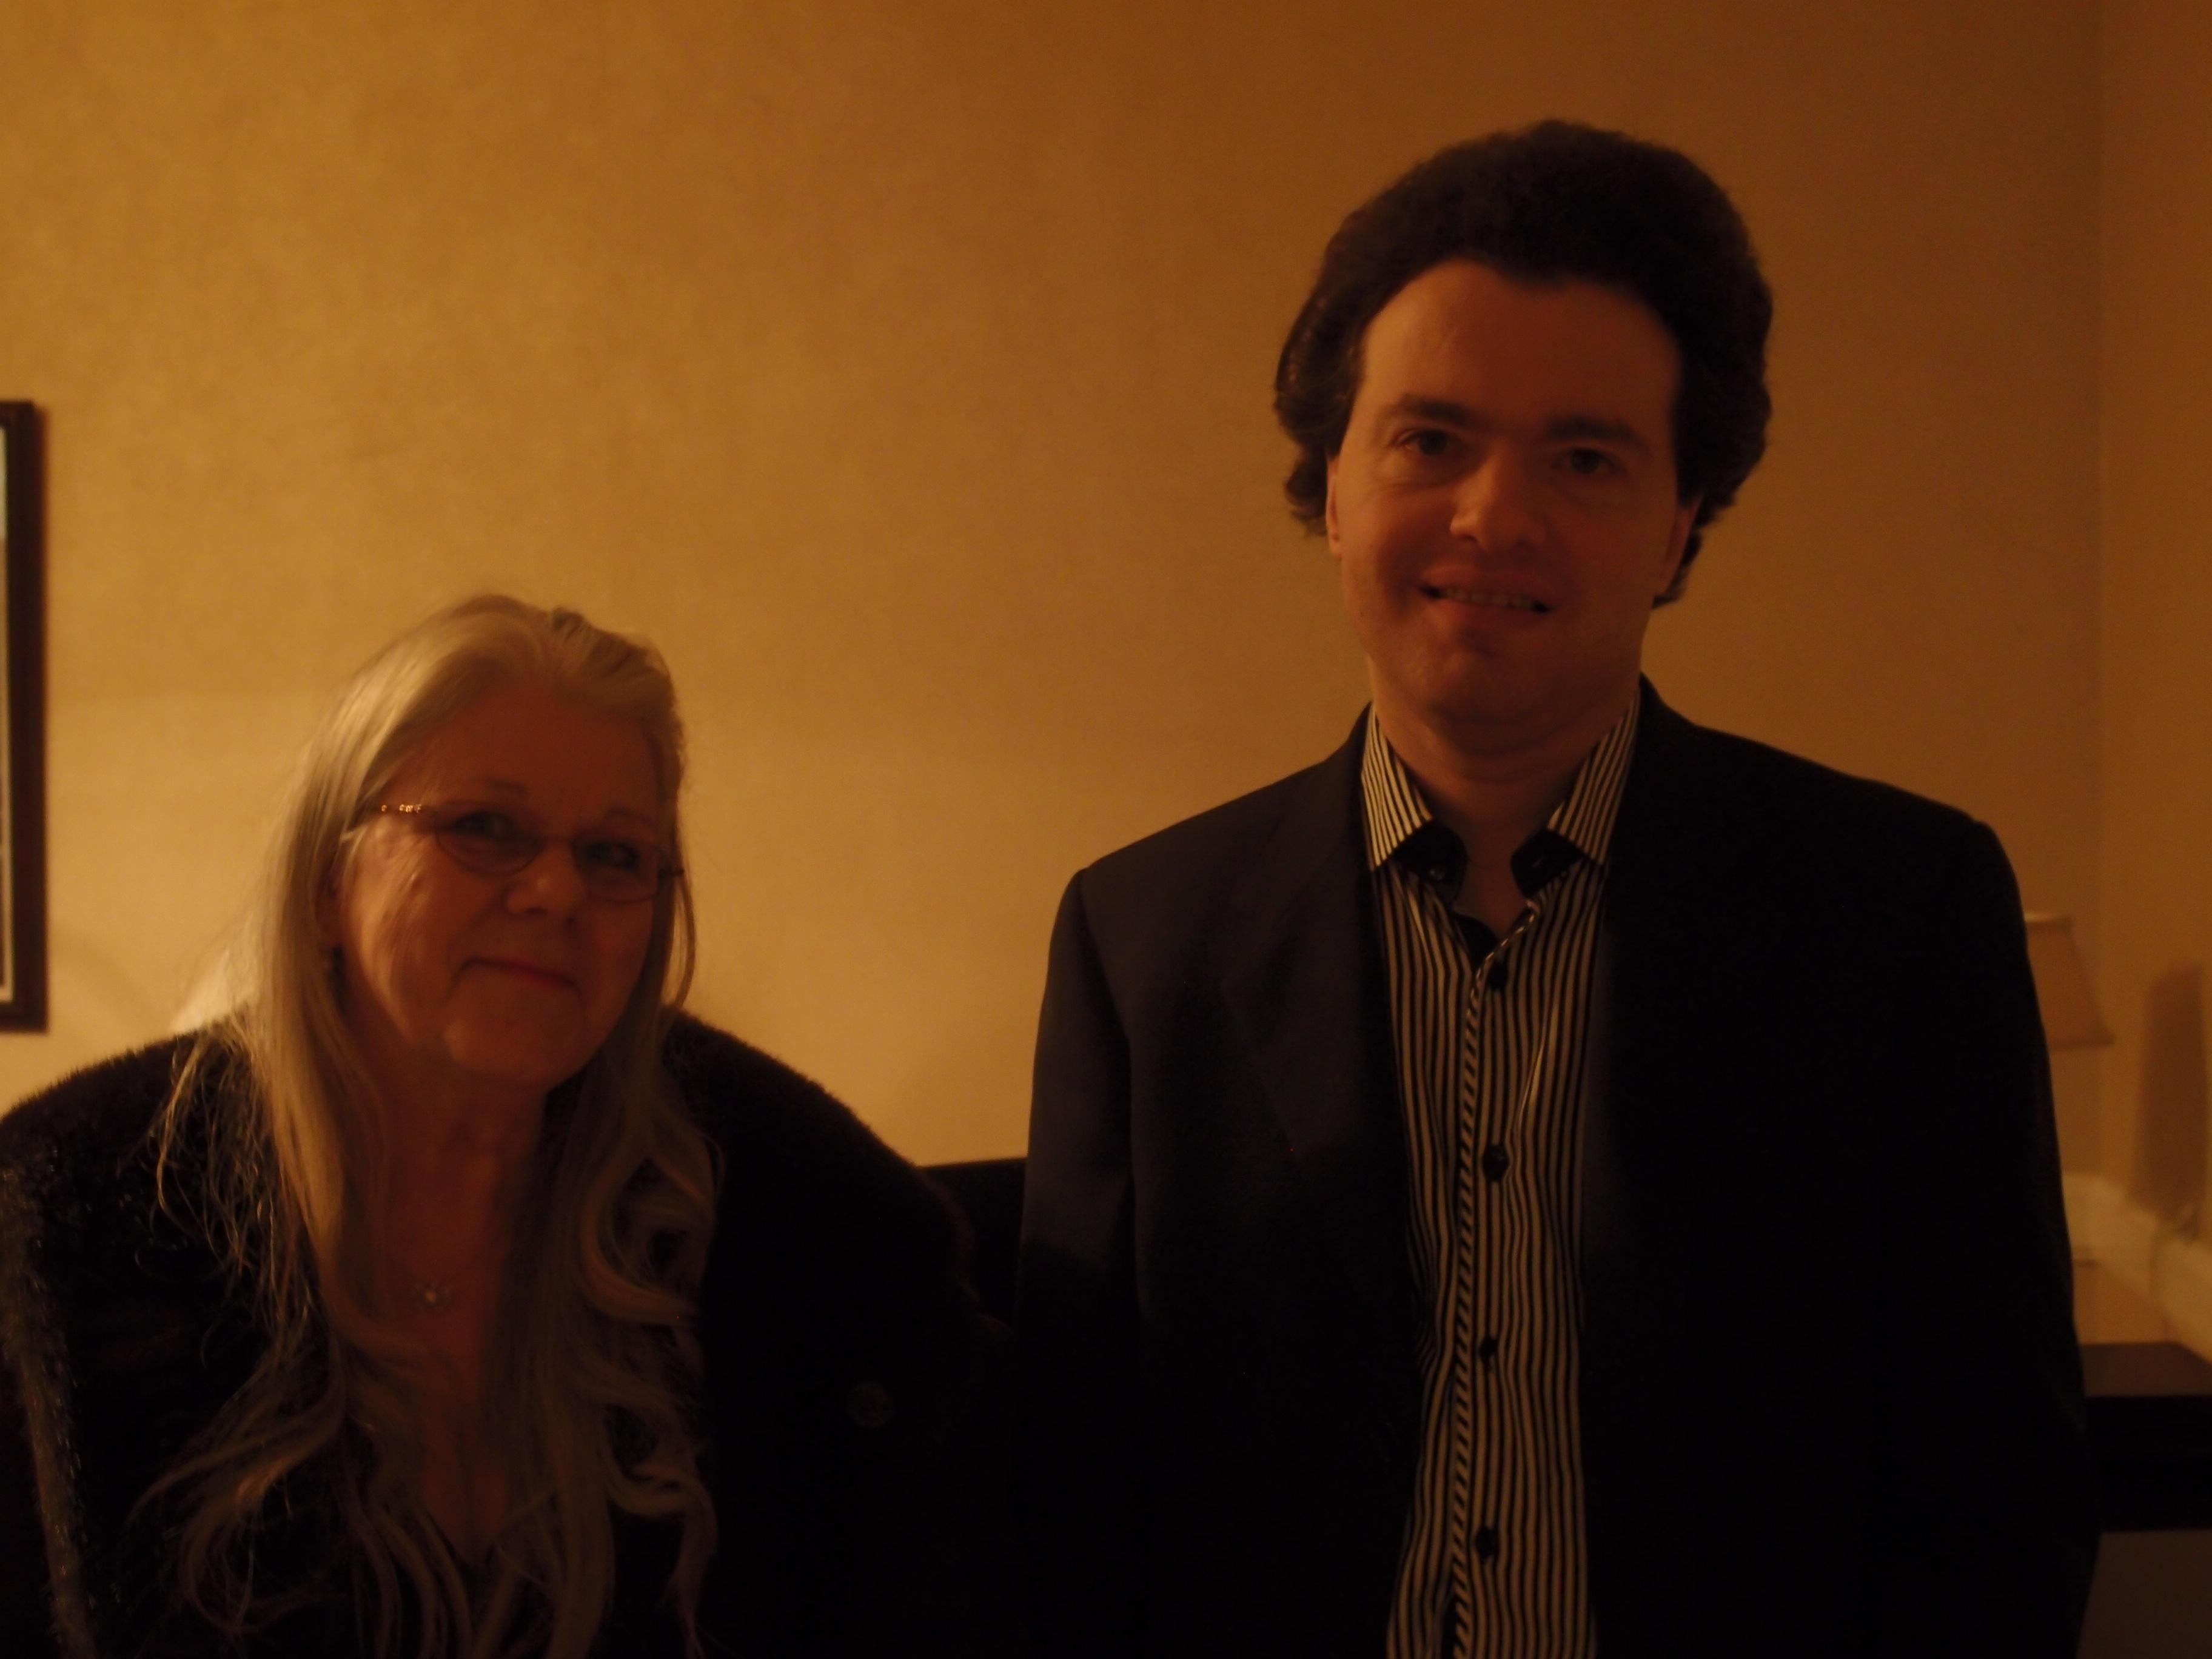 Kathy with Evgeny Kissin